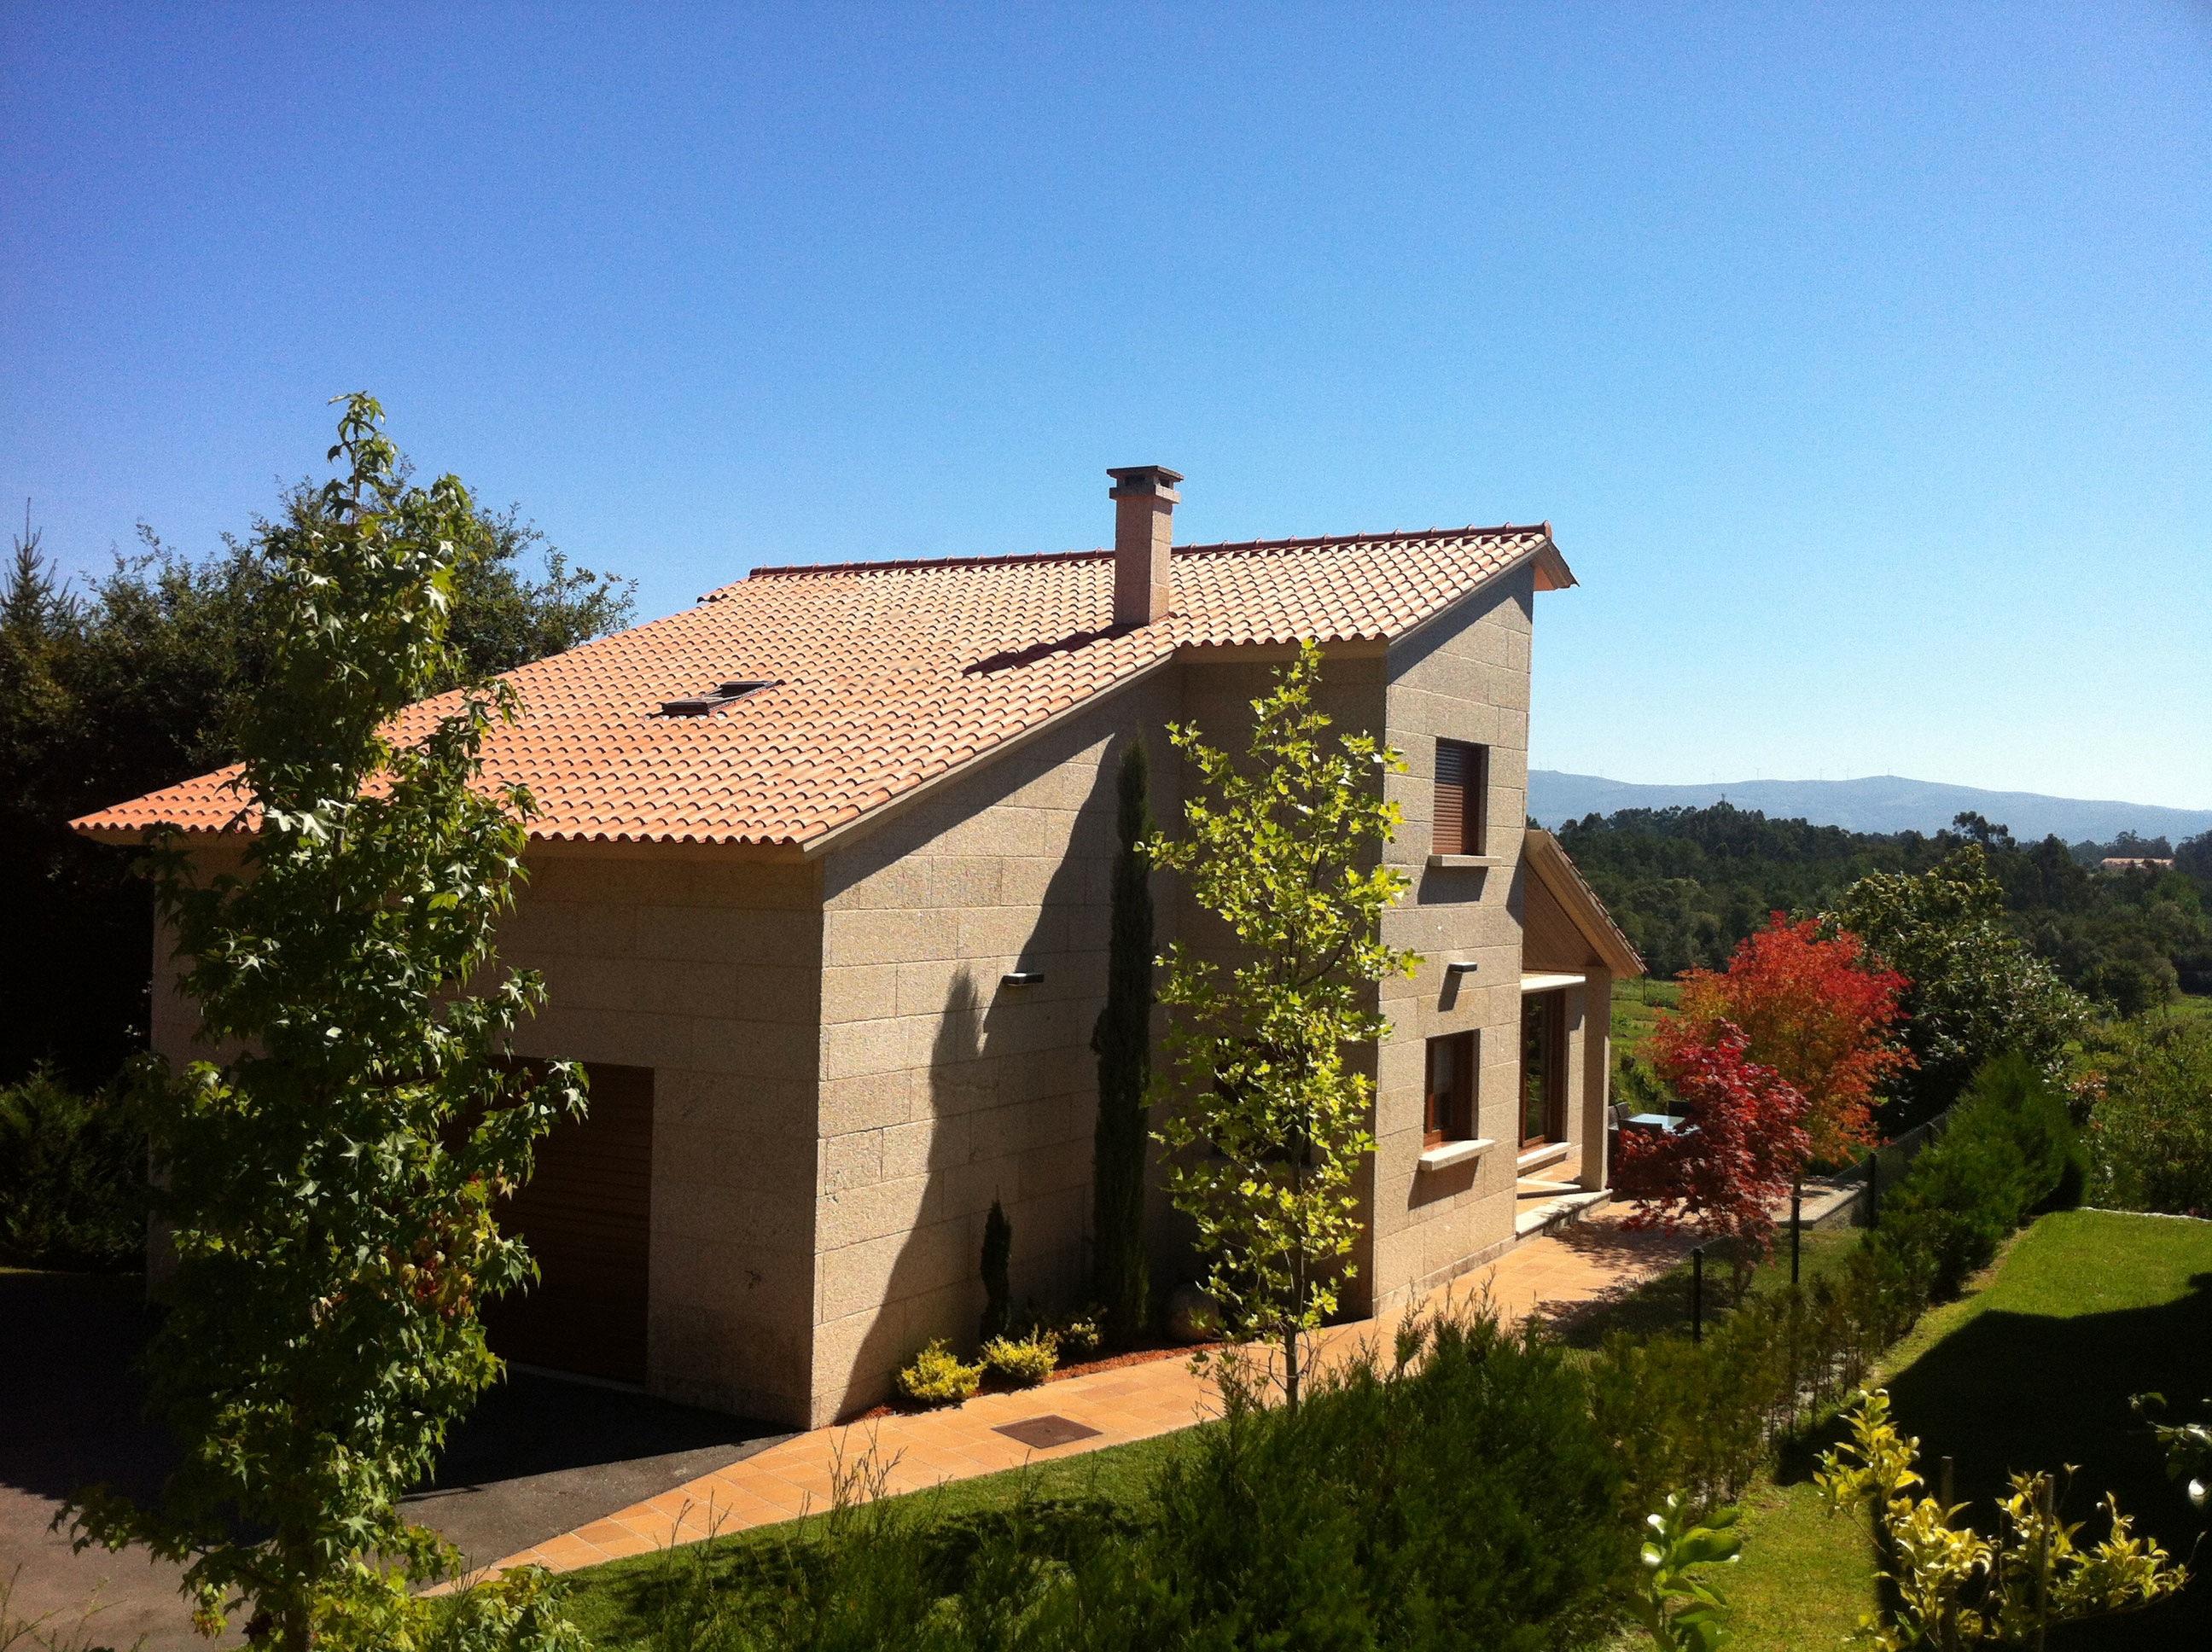 Casa con encanto de turismo rural en galicia rias baixas - Casas con encanto galicia ...